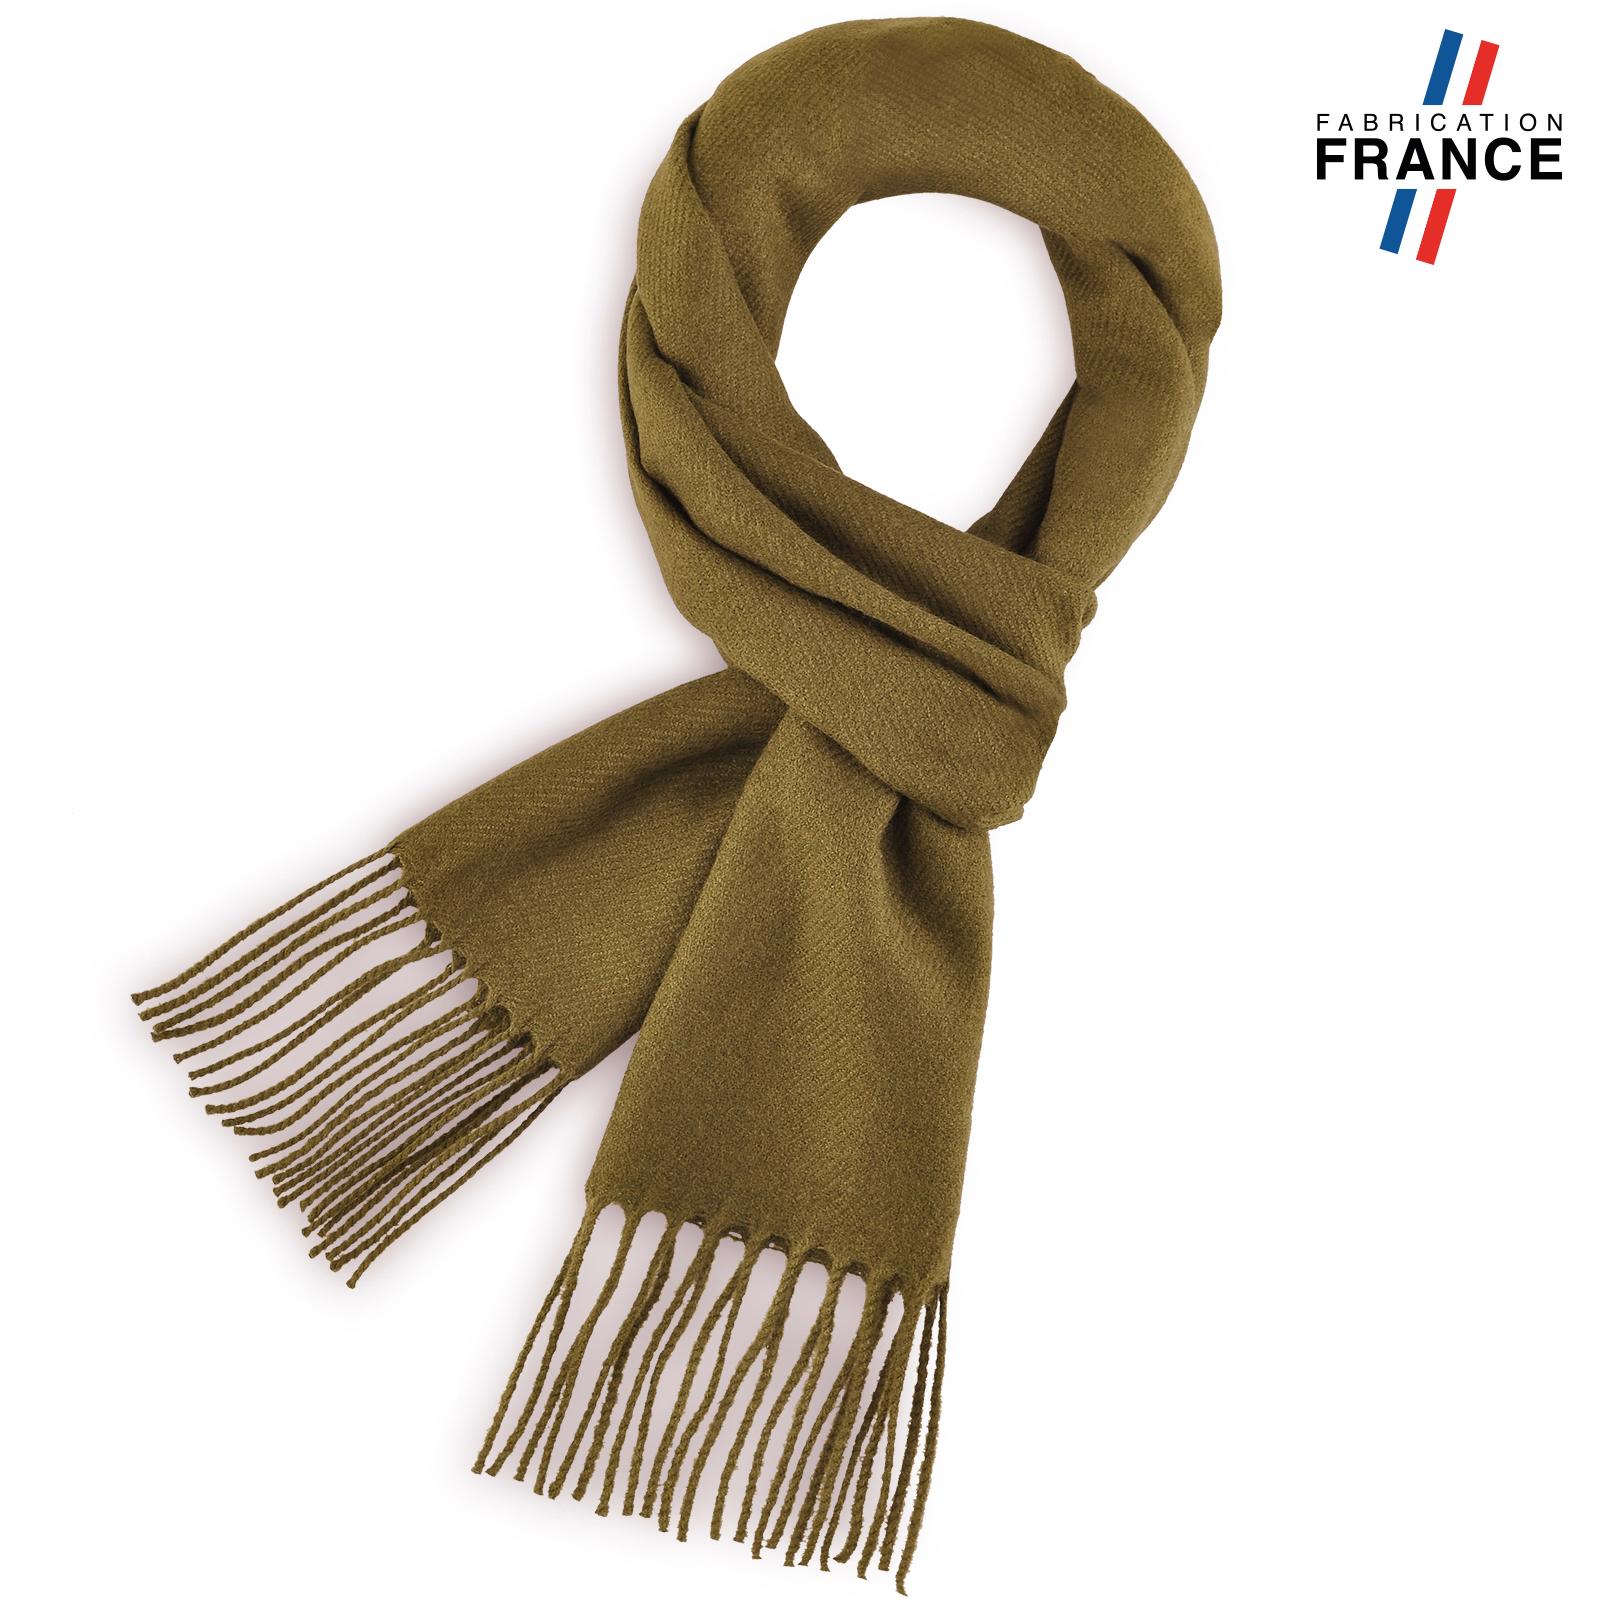 AT-03236-F16-echarpe-a-franges-kaki-fabrication-francaise